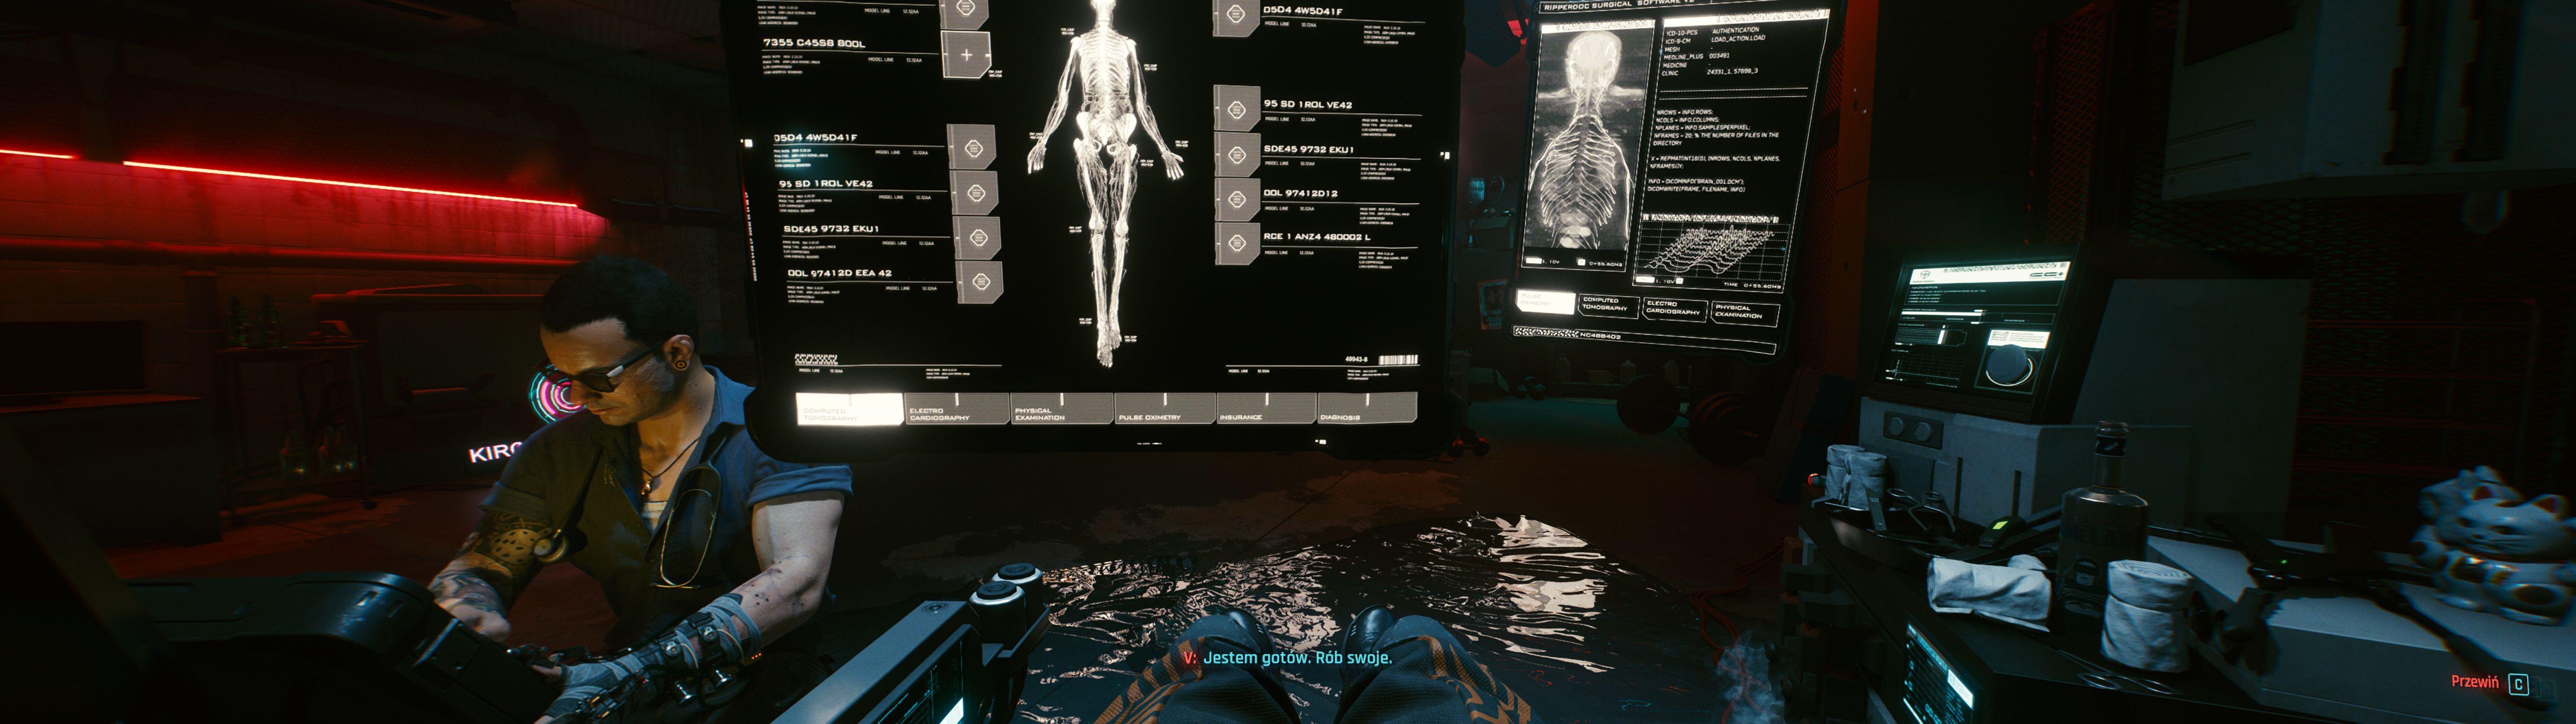 Cyberpunk_2077_C_2020_by_CD_Projekt_RED_19.01.2021_01_40_12_P_P